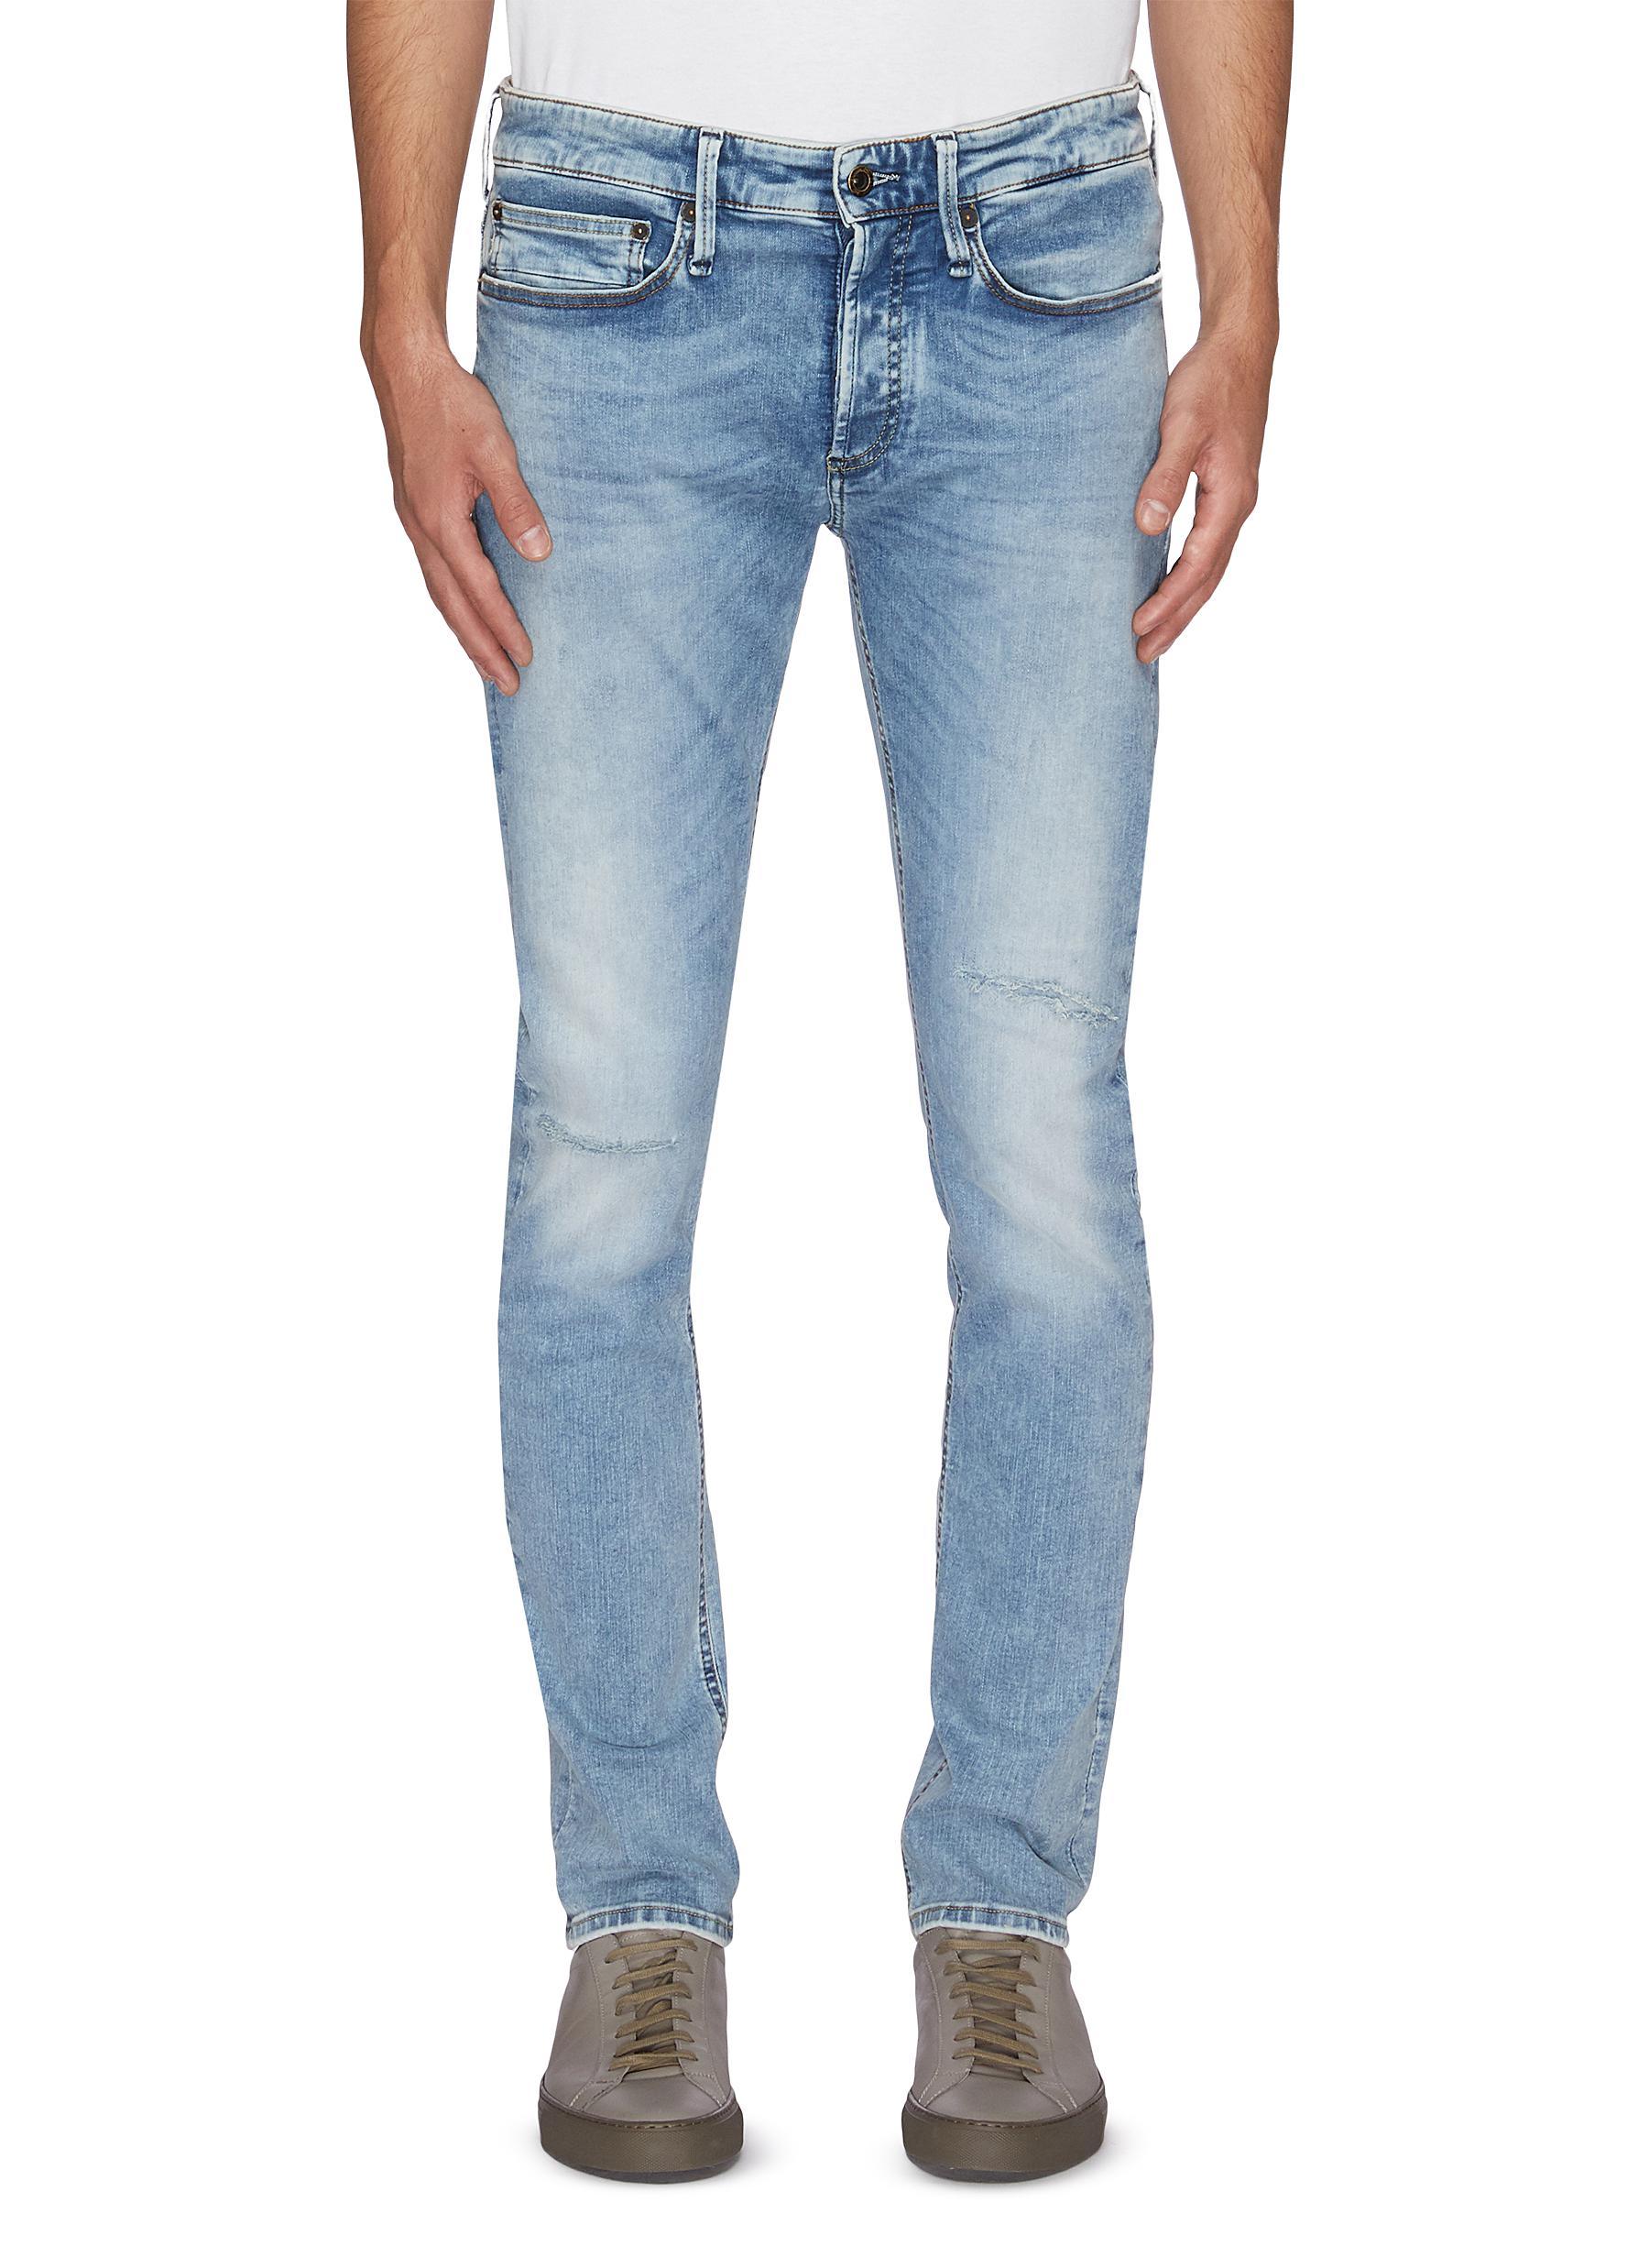 Bolt' Skinny Jeans - DENHAM - Modalova